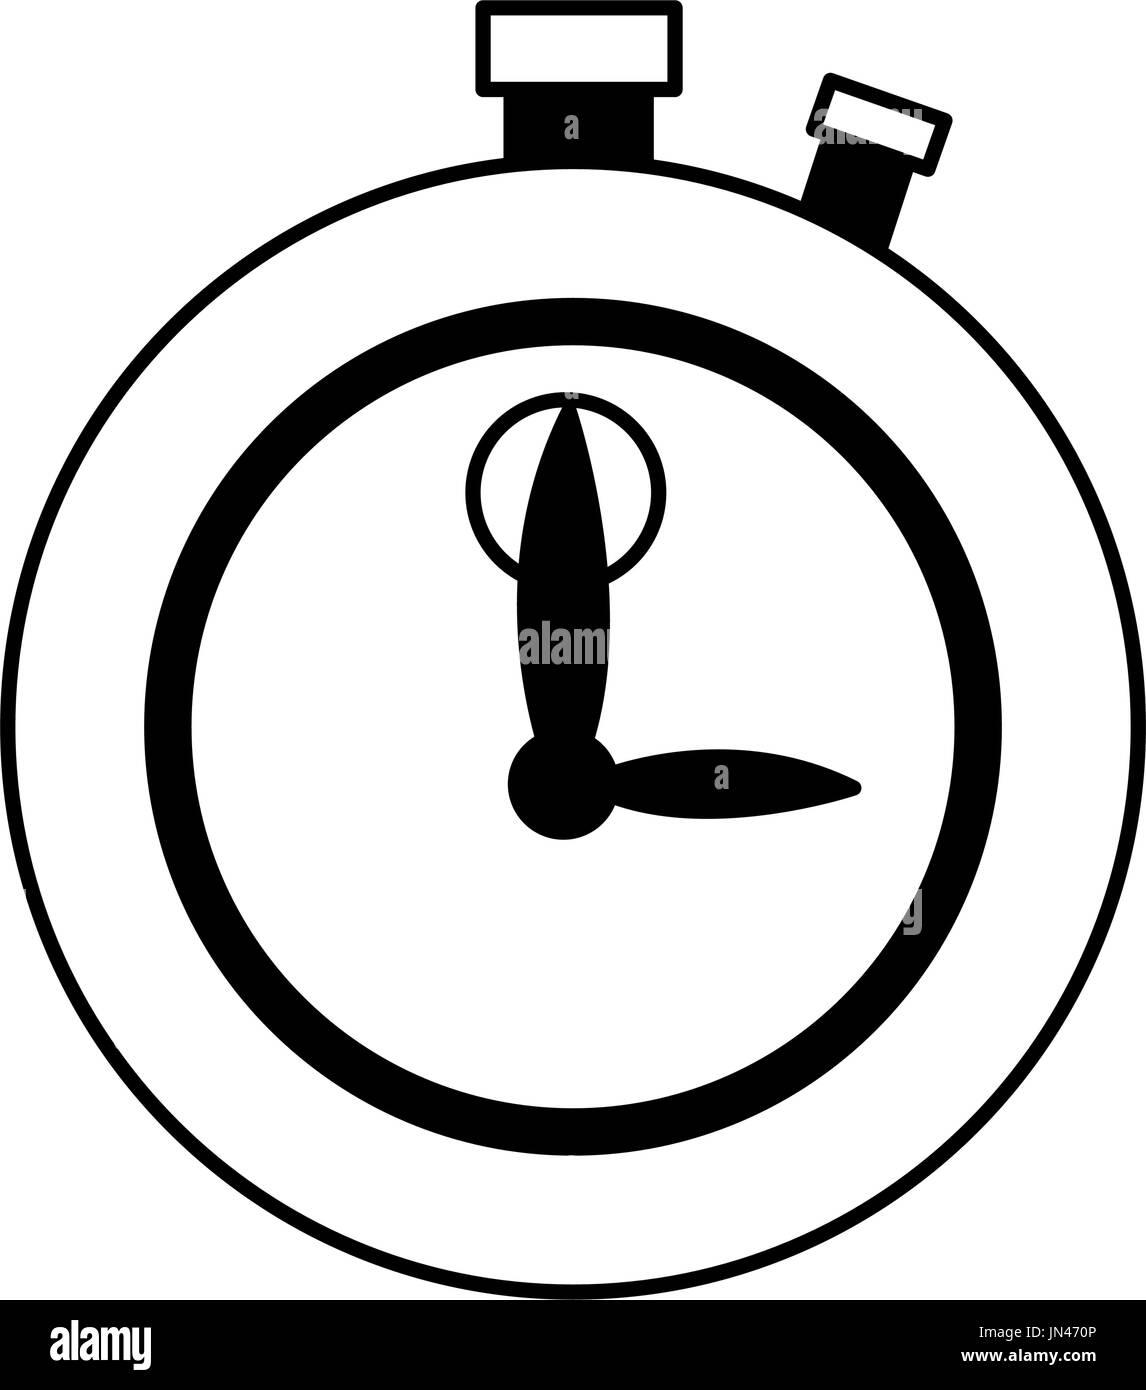 stopwatch chronometer precision timepiece flat icon - Stock Image